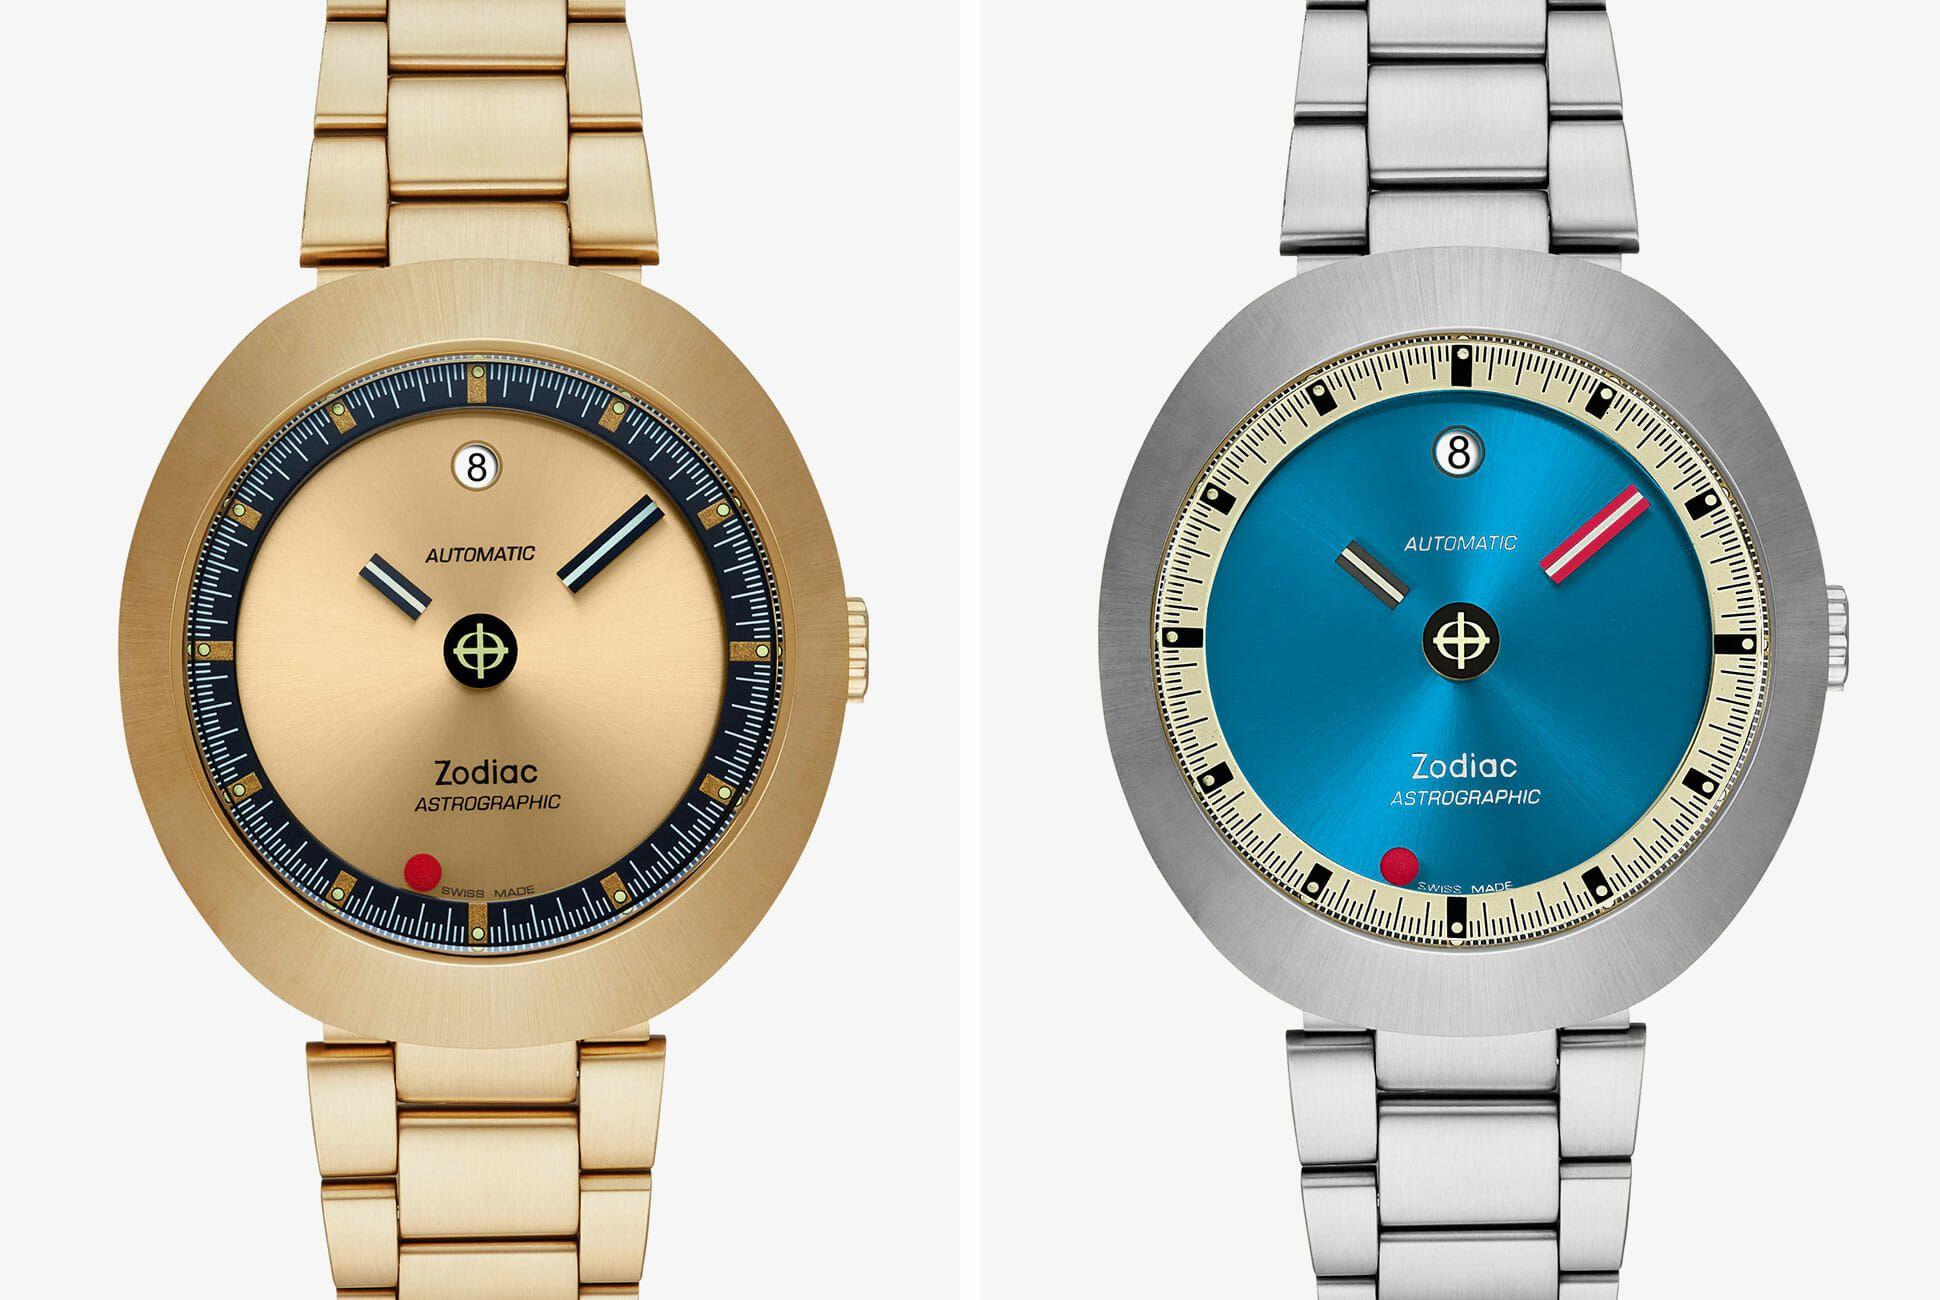 Zodiac-Astrographic-Watch-gear-patrol-slide-2